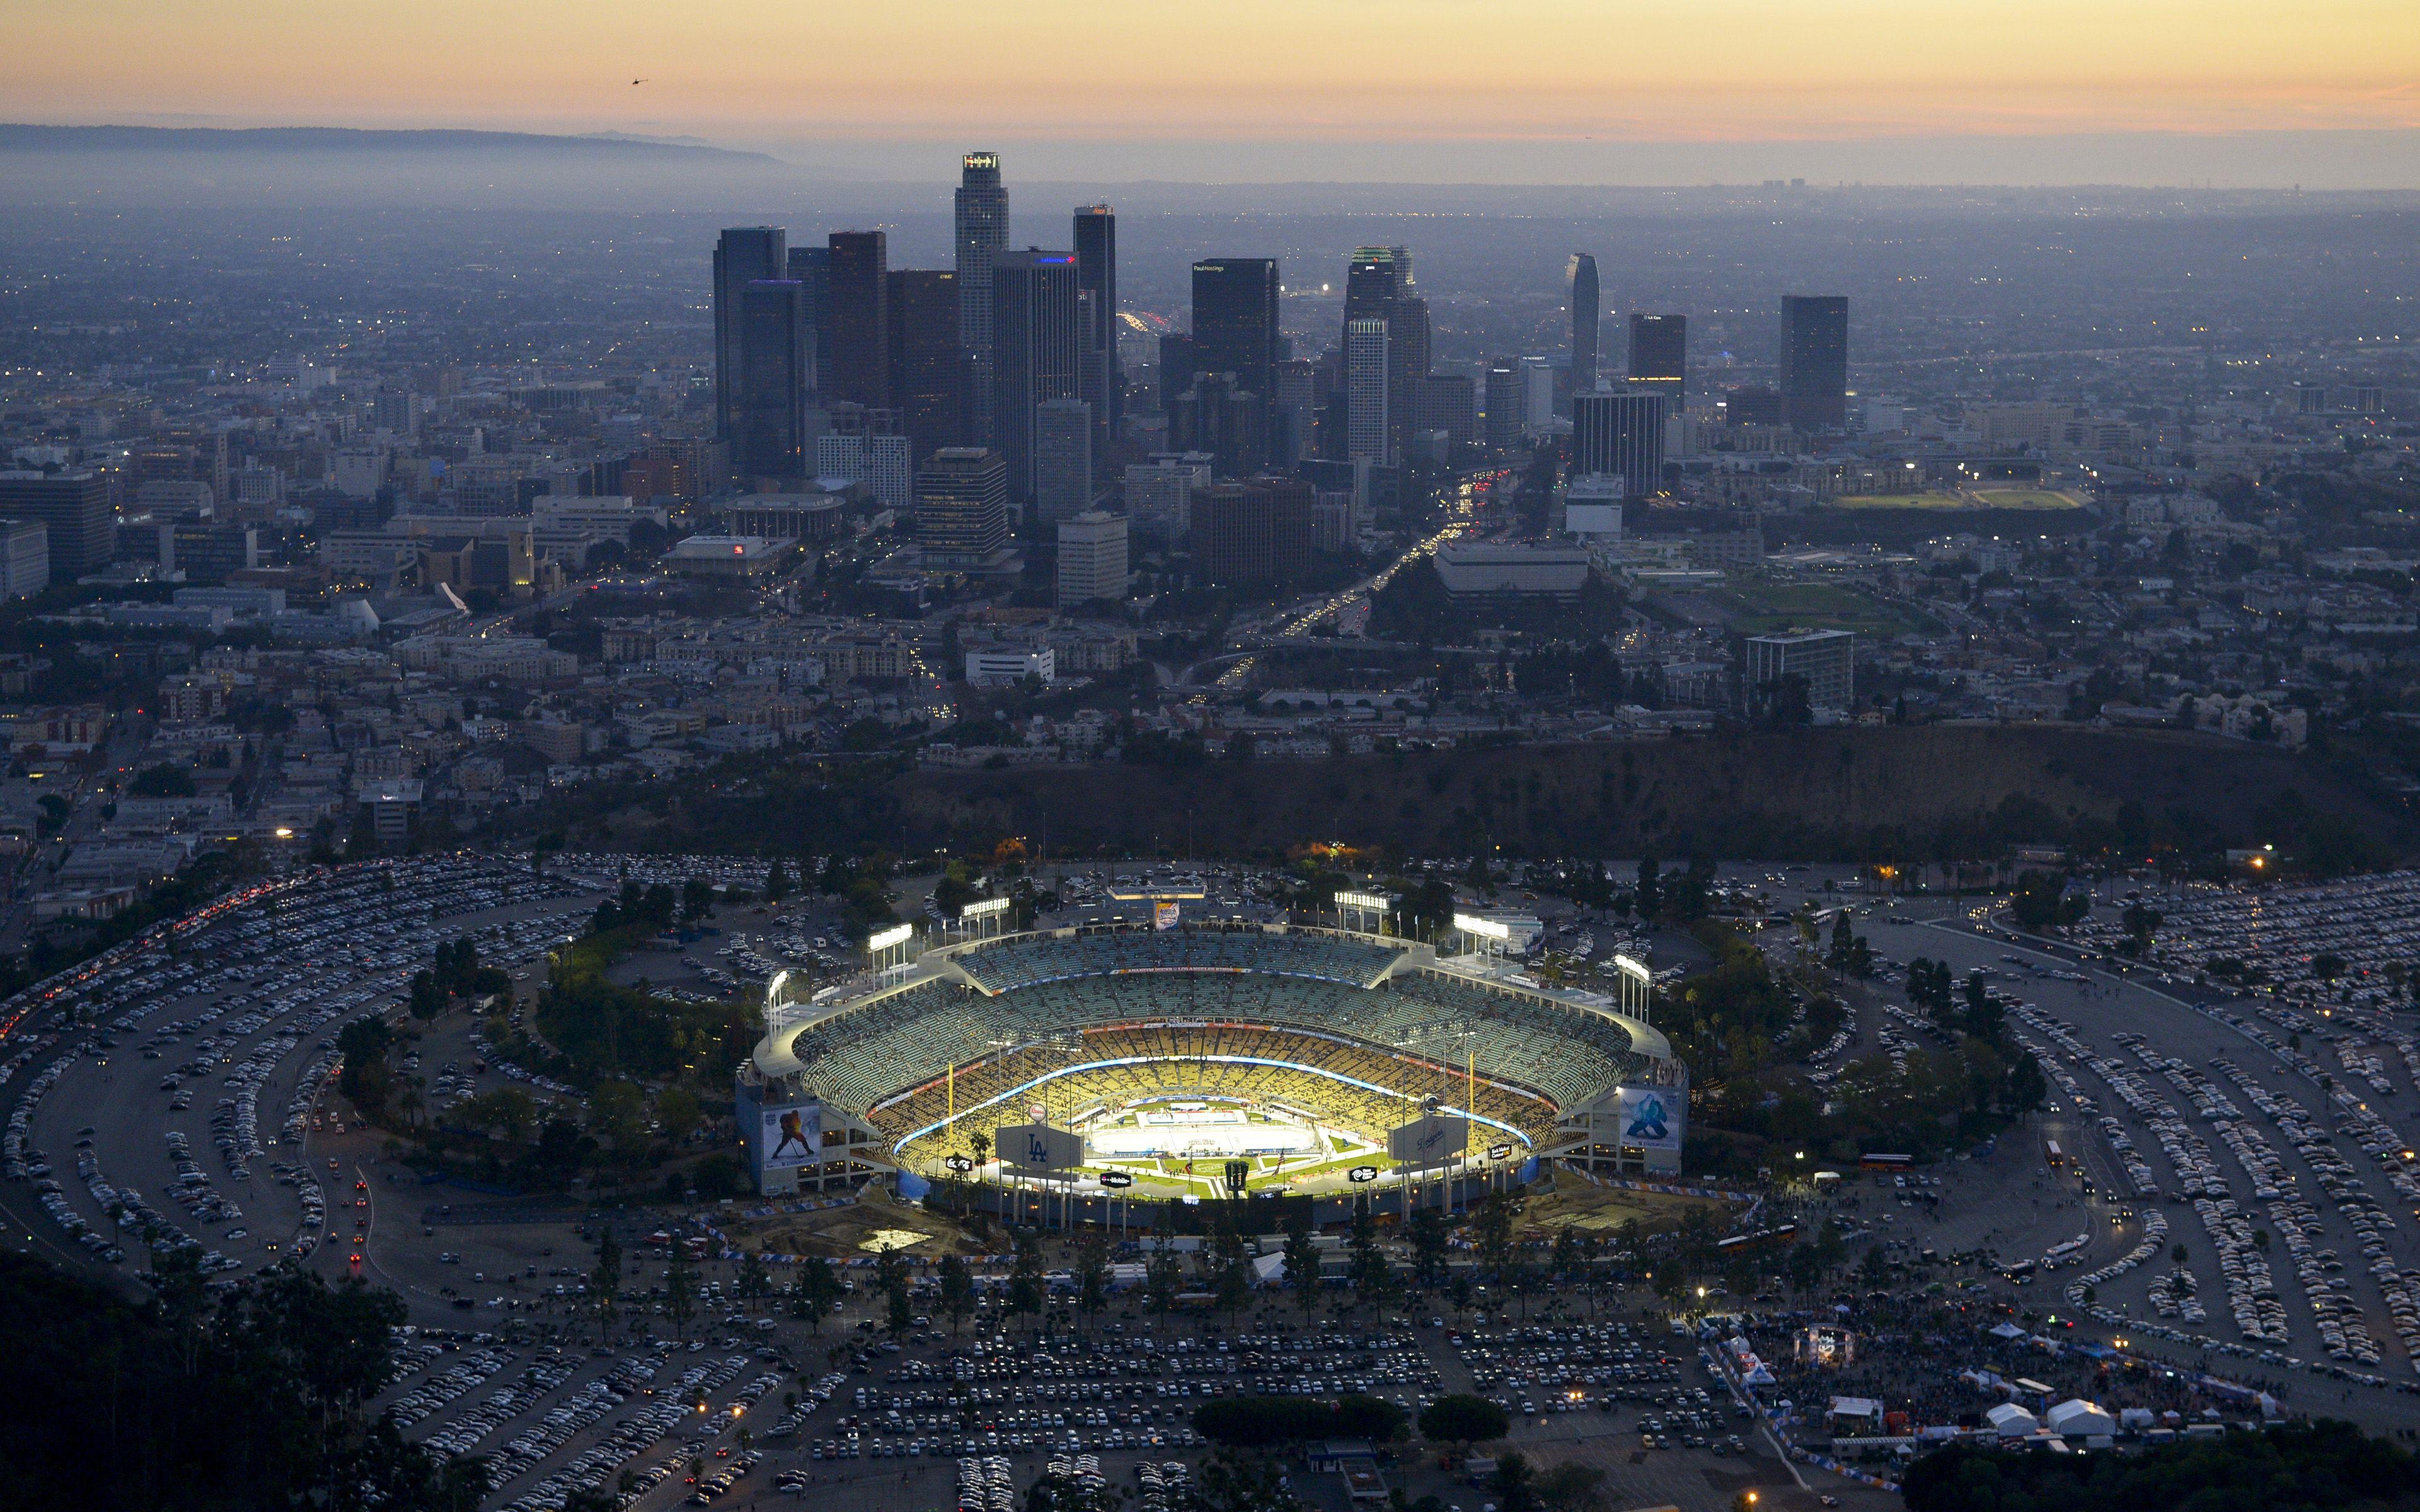 Los Angeles Dodgers Wallpaper Dre The Los Angeles Dodgers Los Angeles Dodgers Los Angeles Dodgers Stadium Los Angeles